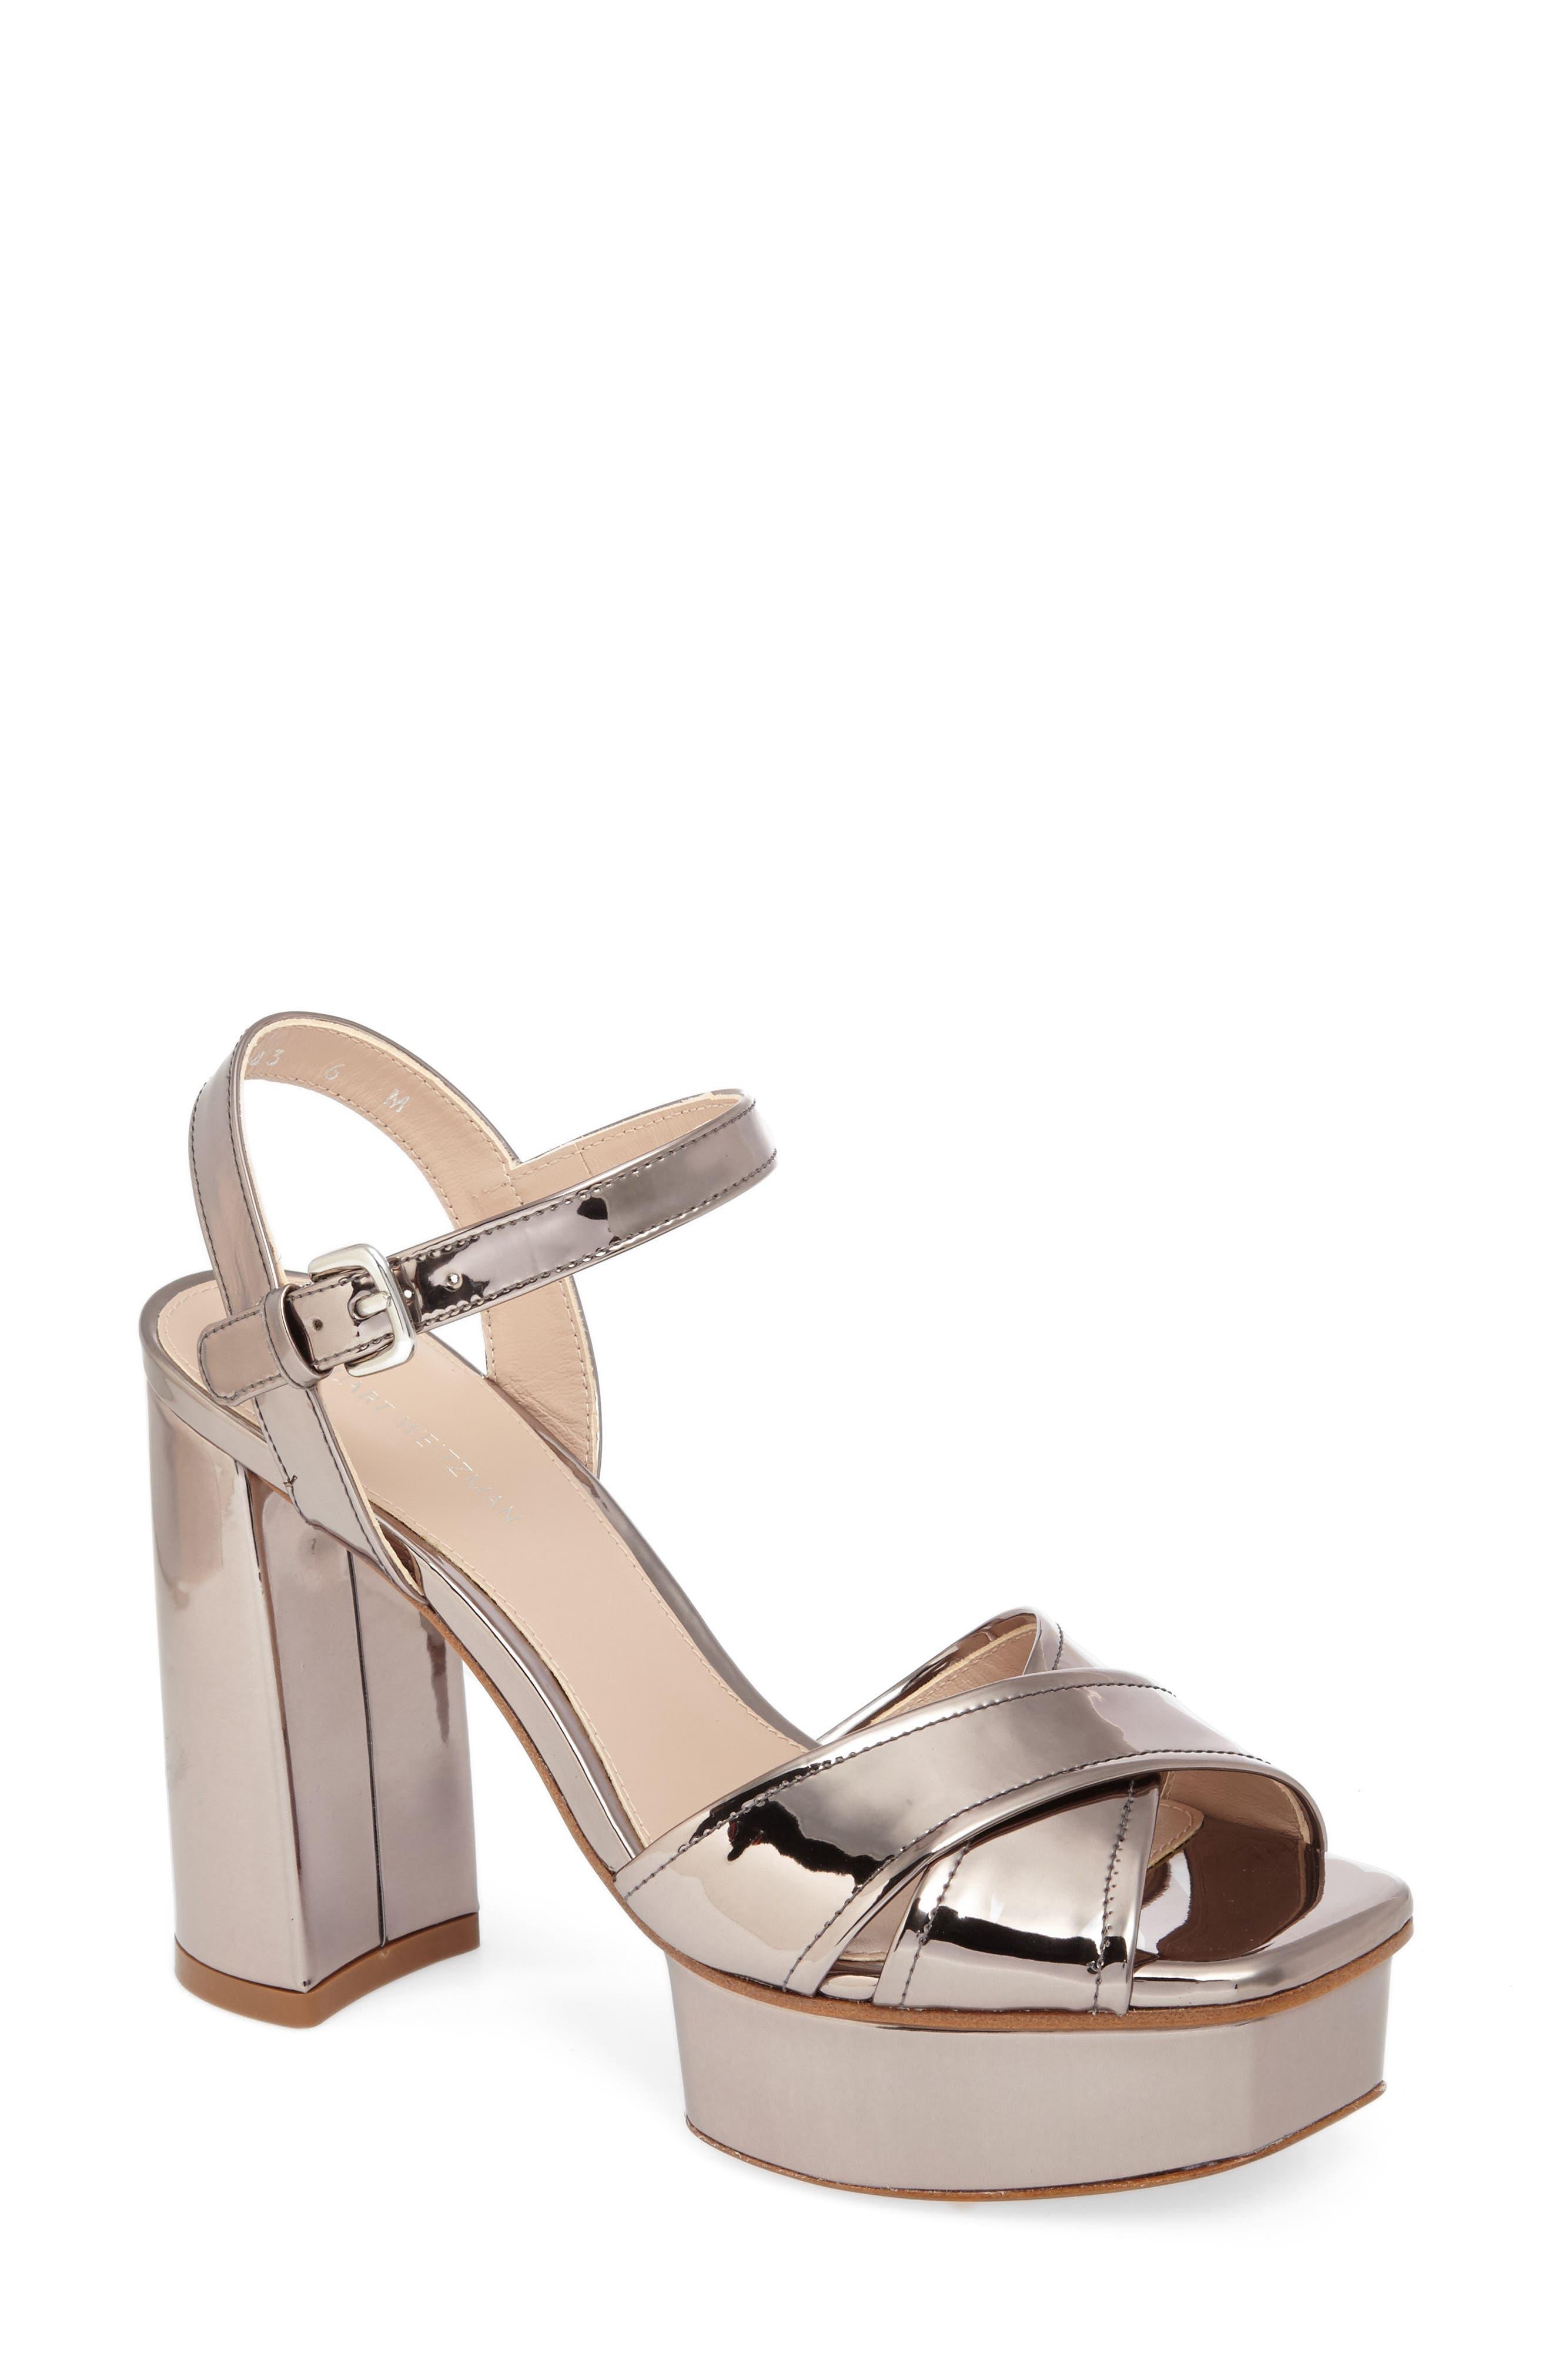 Main Image - Stuart Weitzman Exposed Platform Sandal (Women)